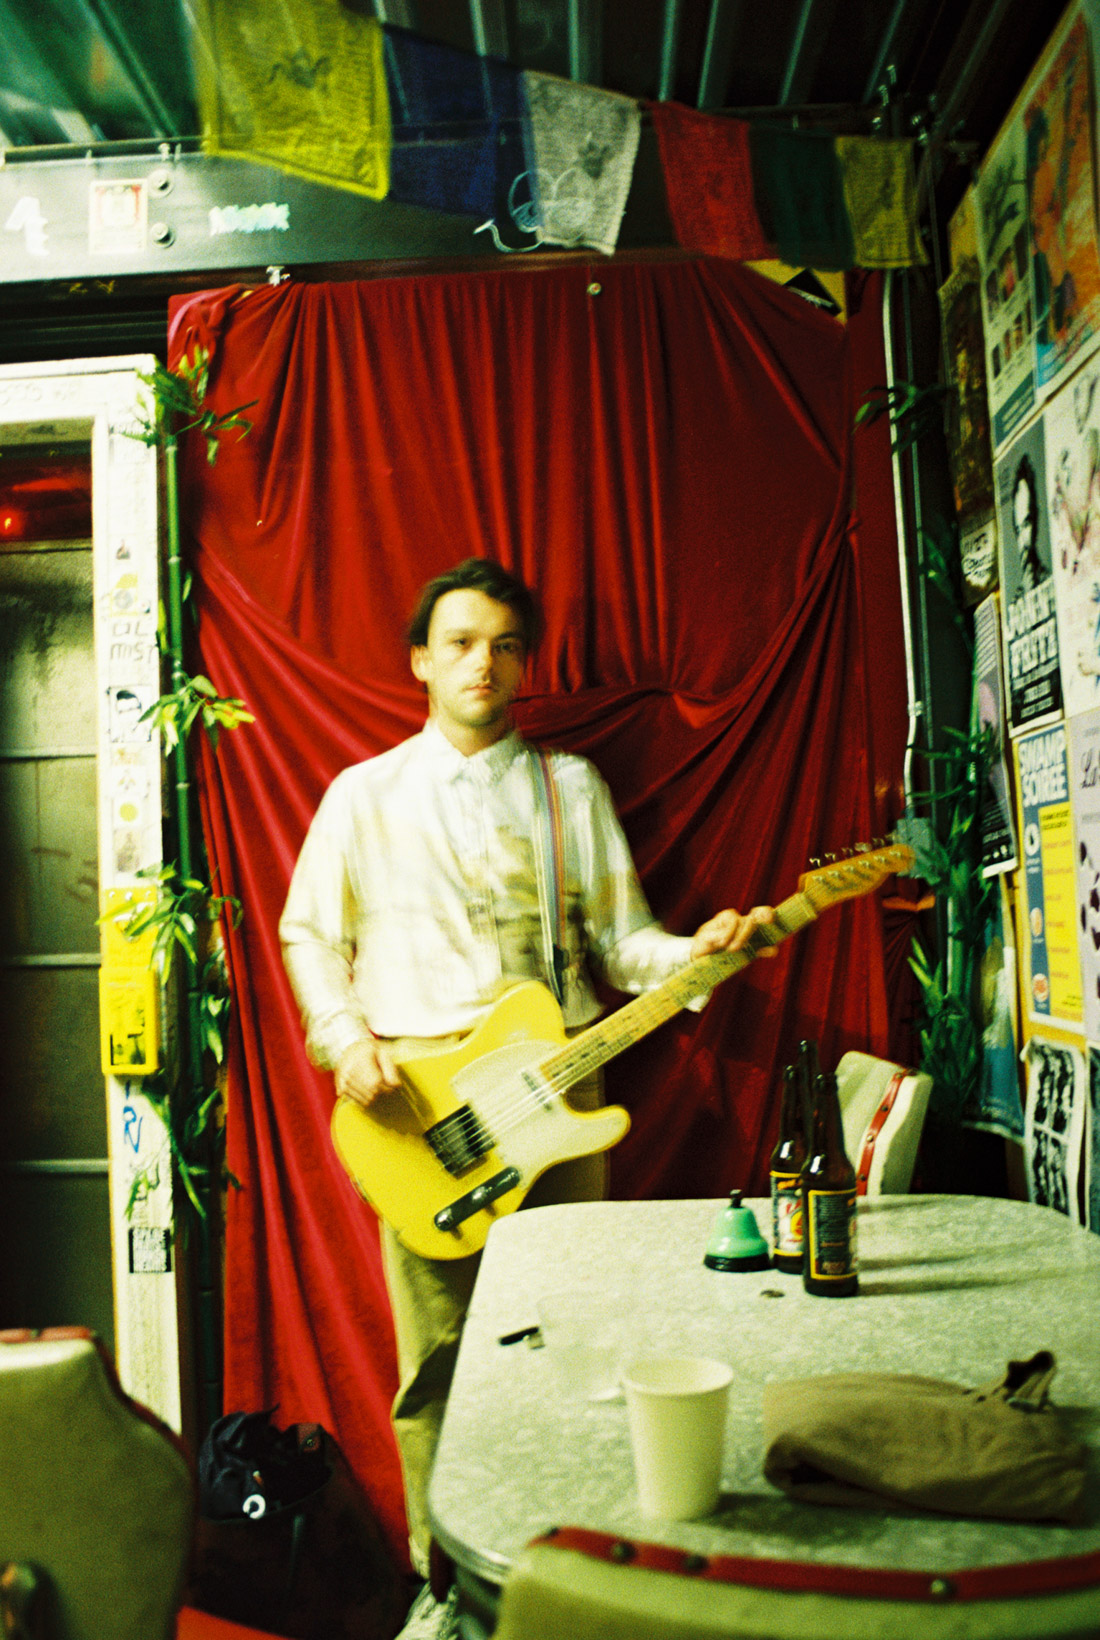 Garrett backstage at Bootleg